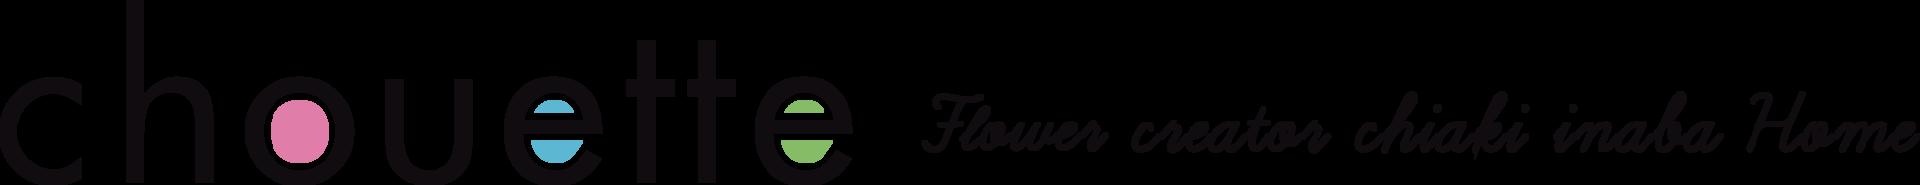 chouette -flower & craft ひたちな市 桜川市-